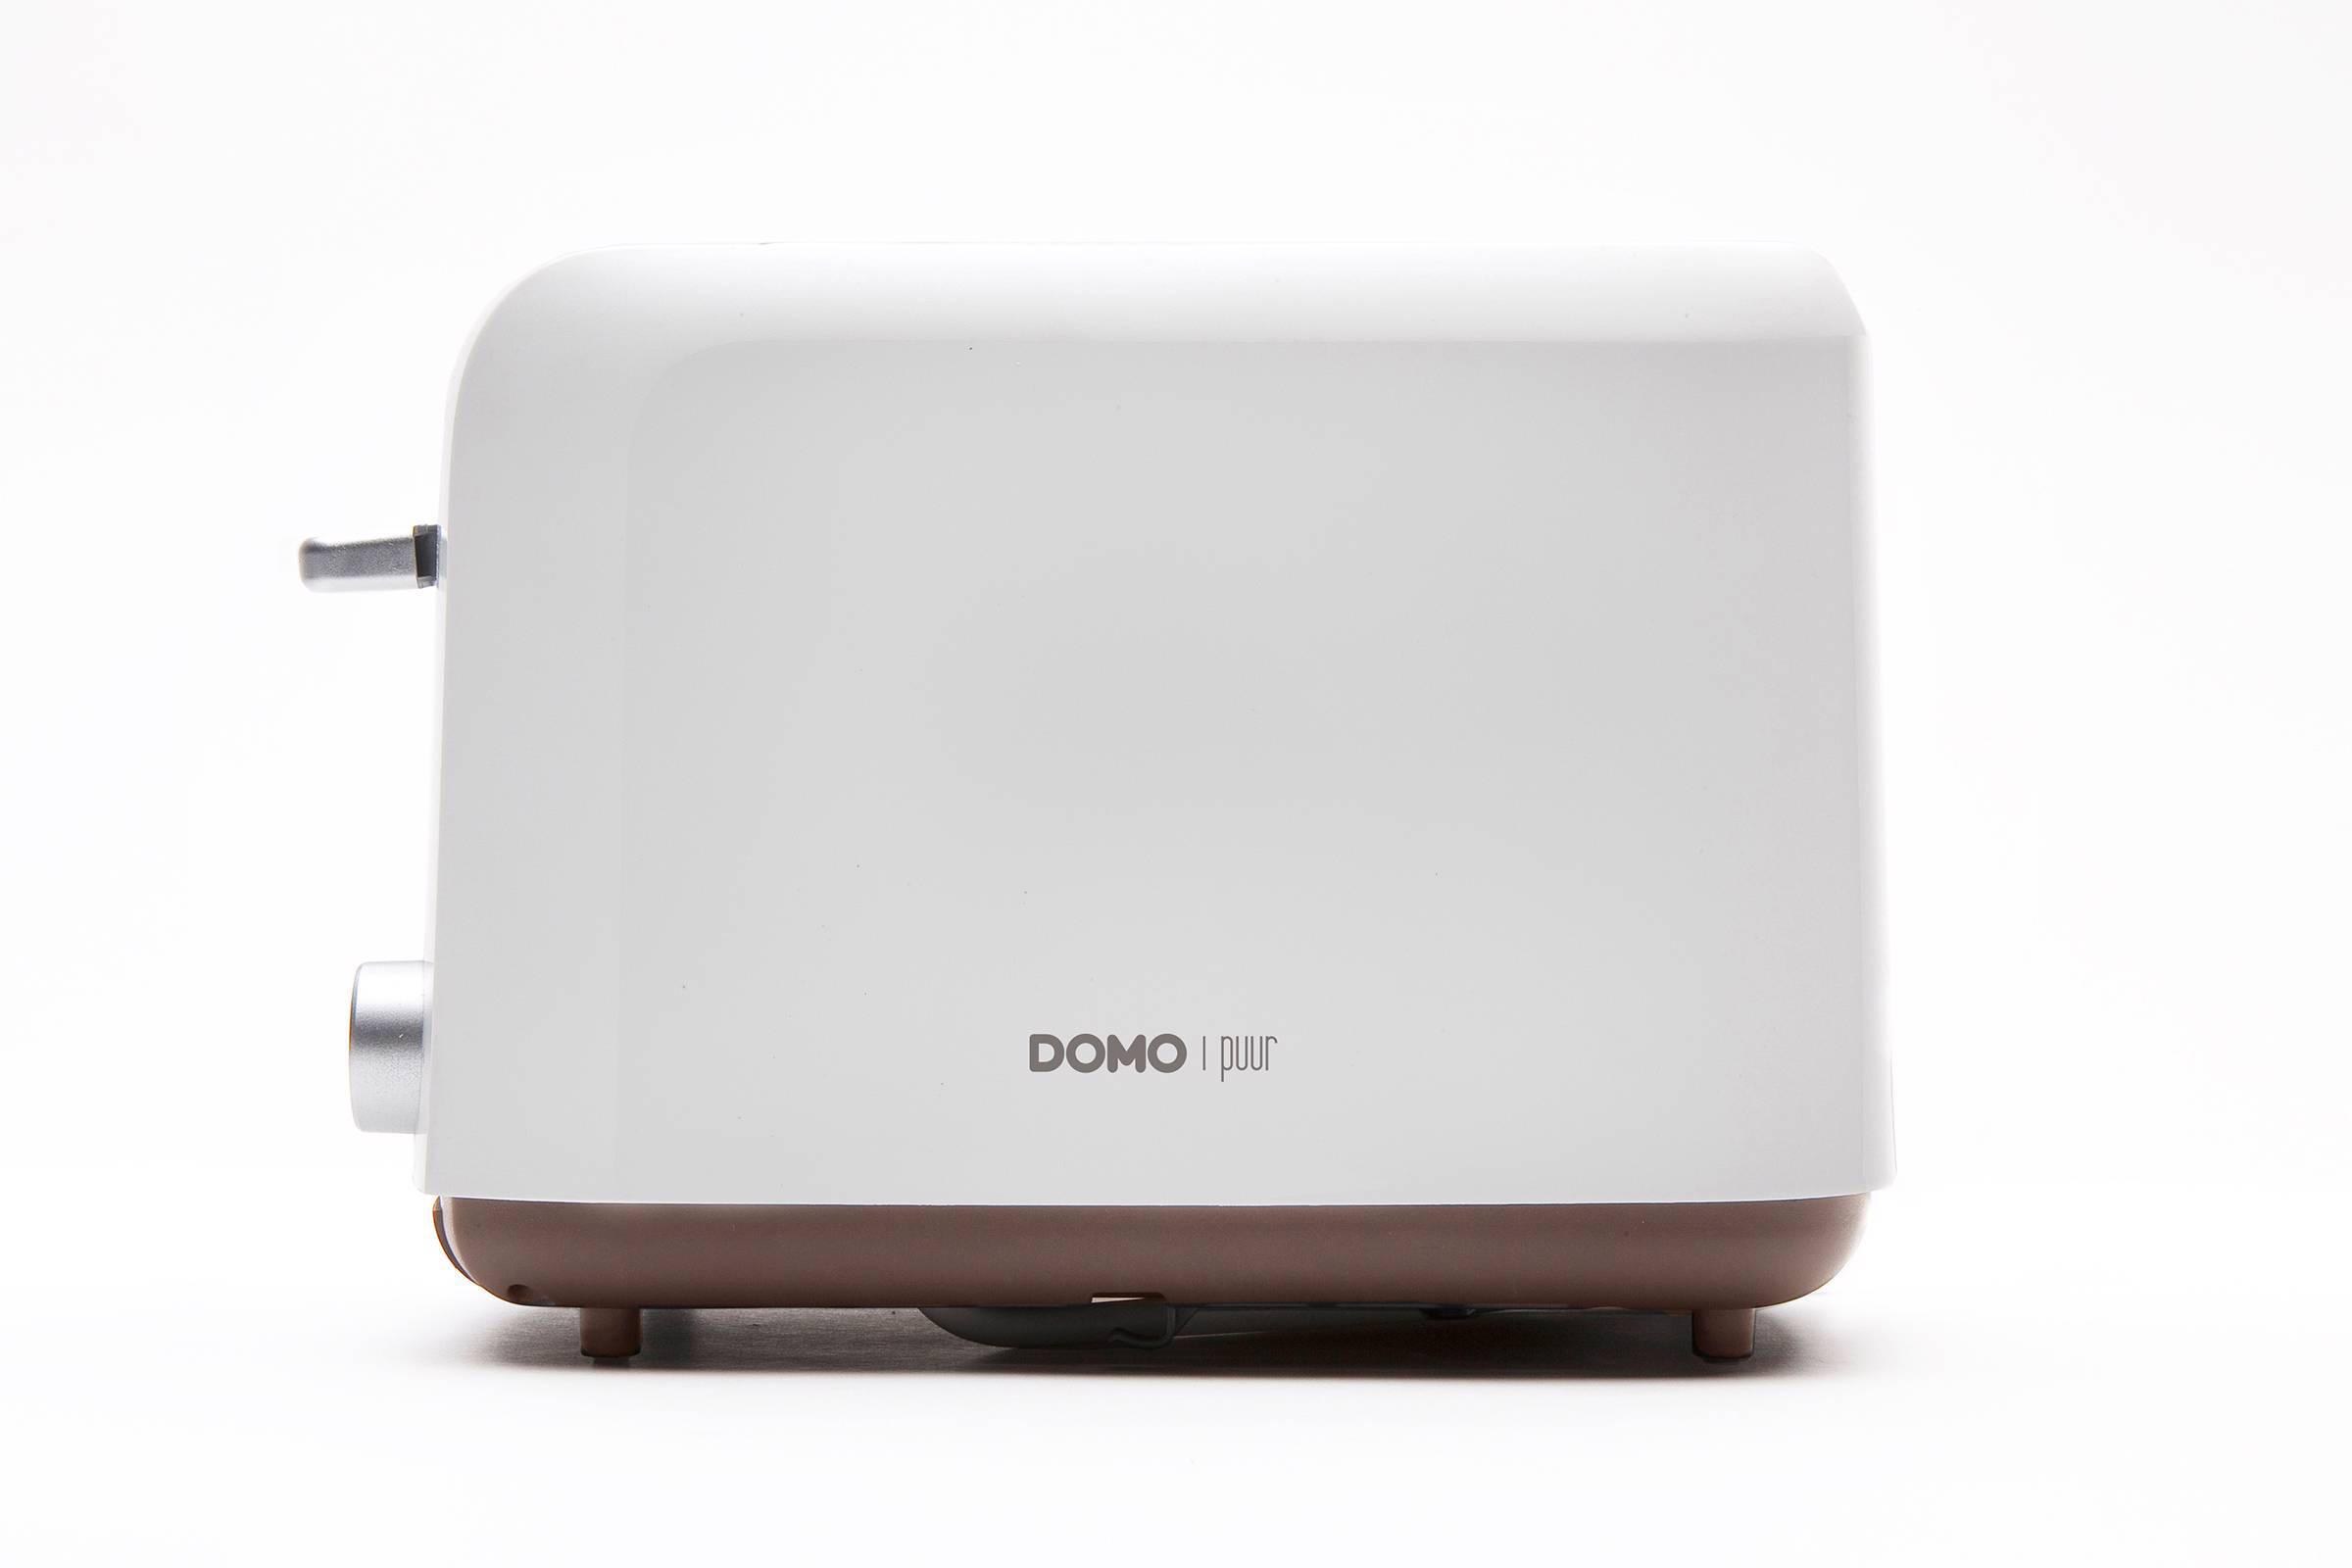 Badkamer Verwarming Domo : Domo puur do t broodrooster wehkamp